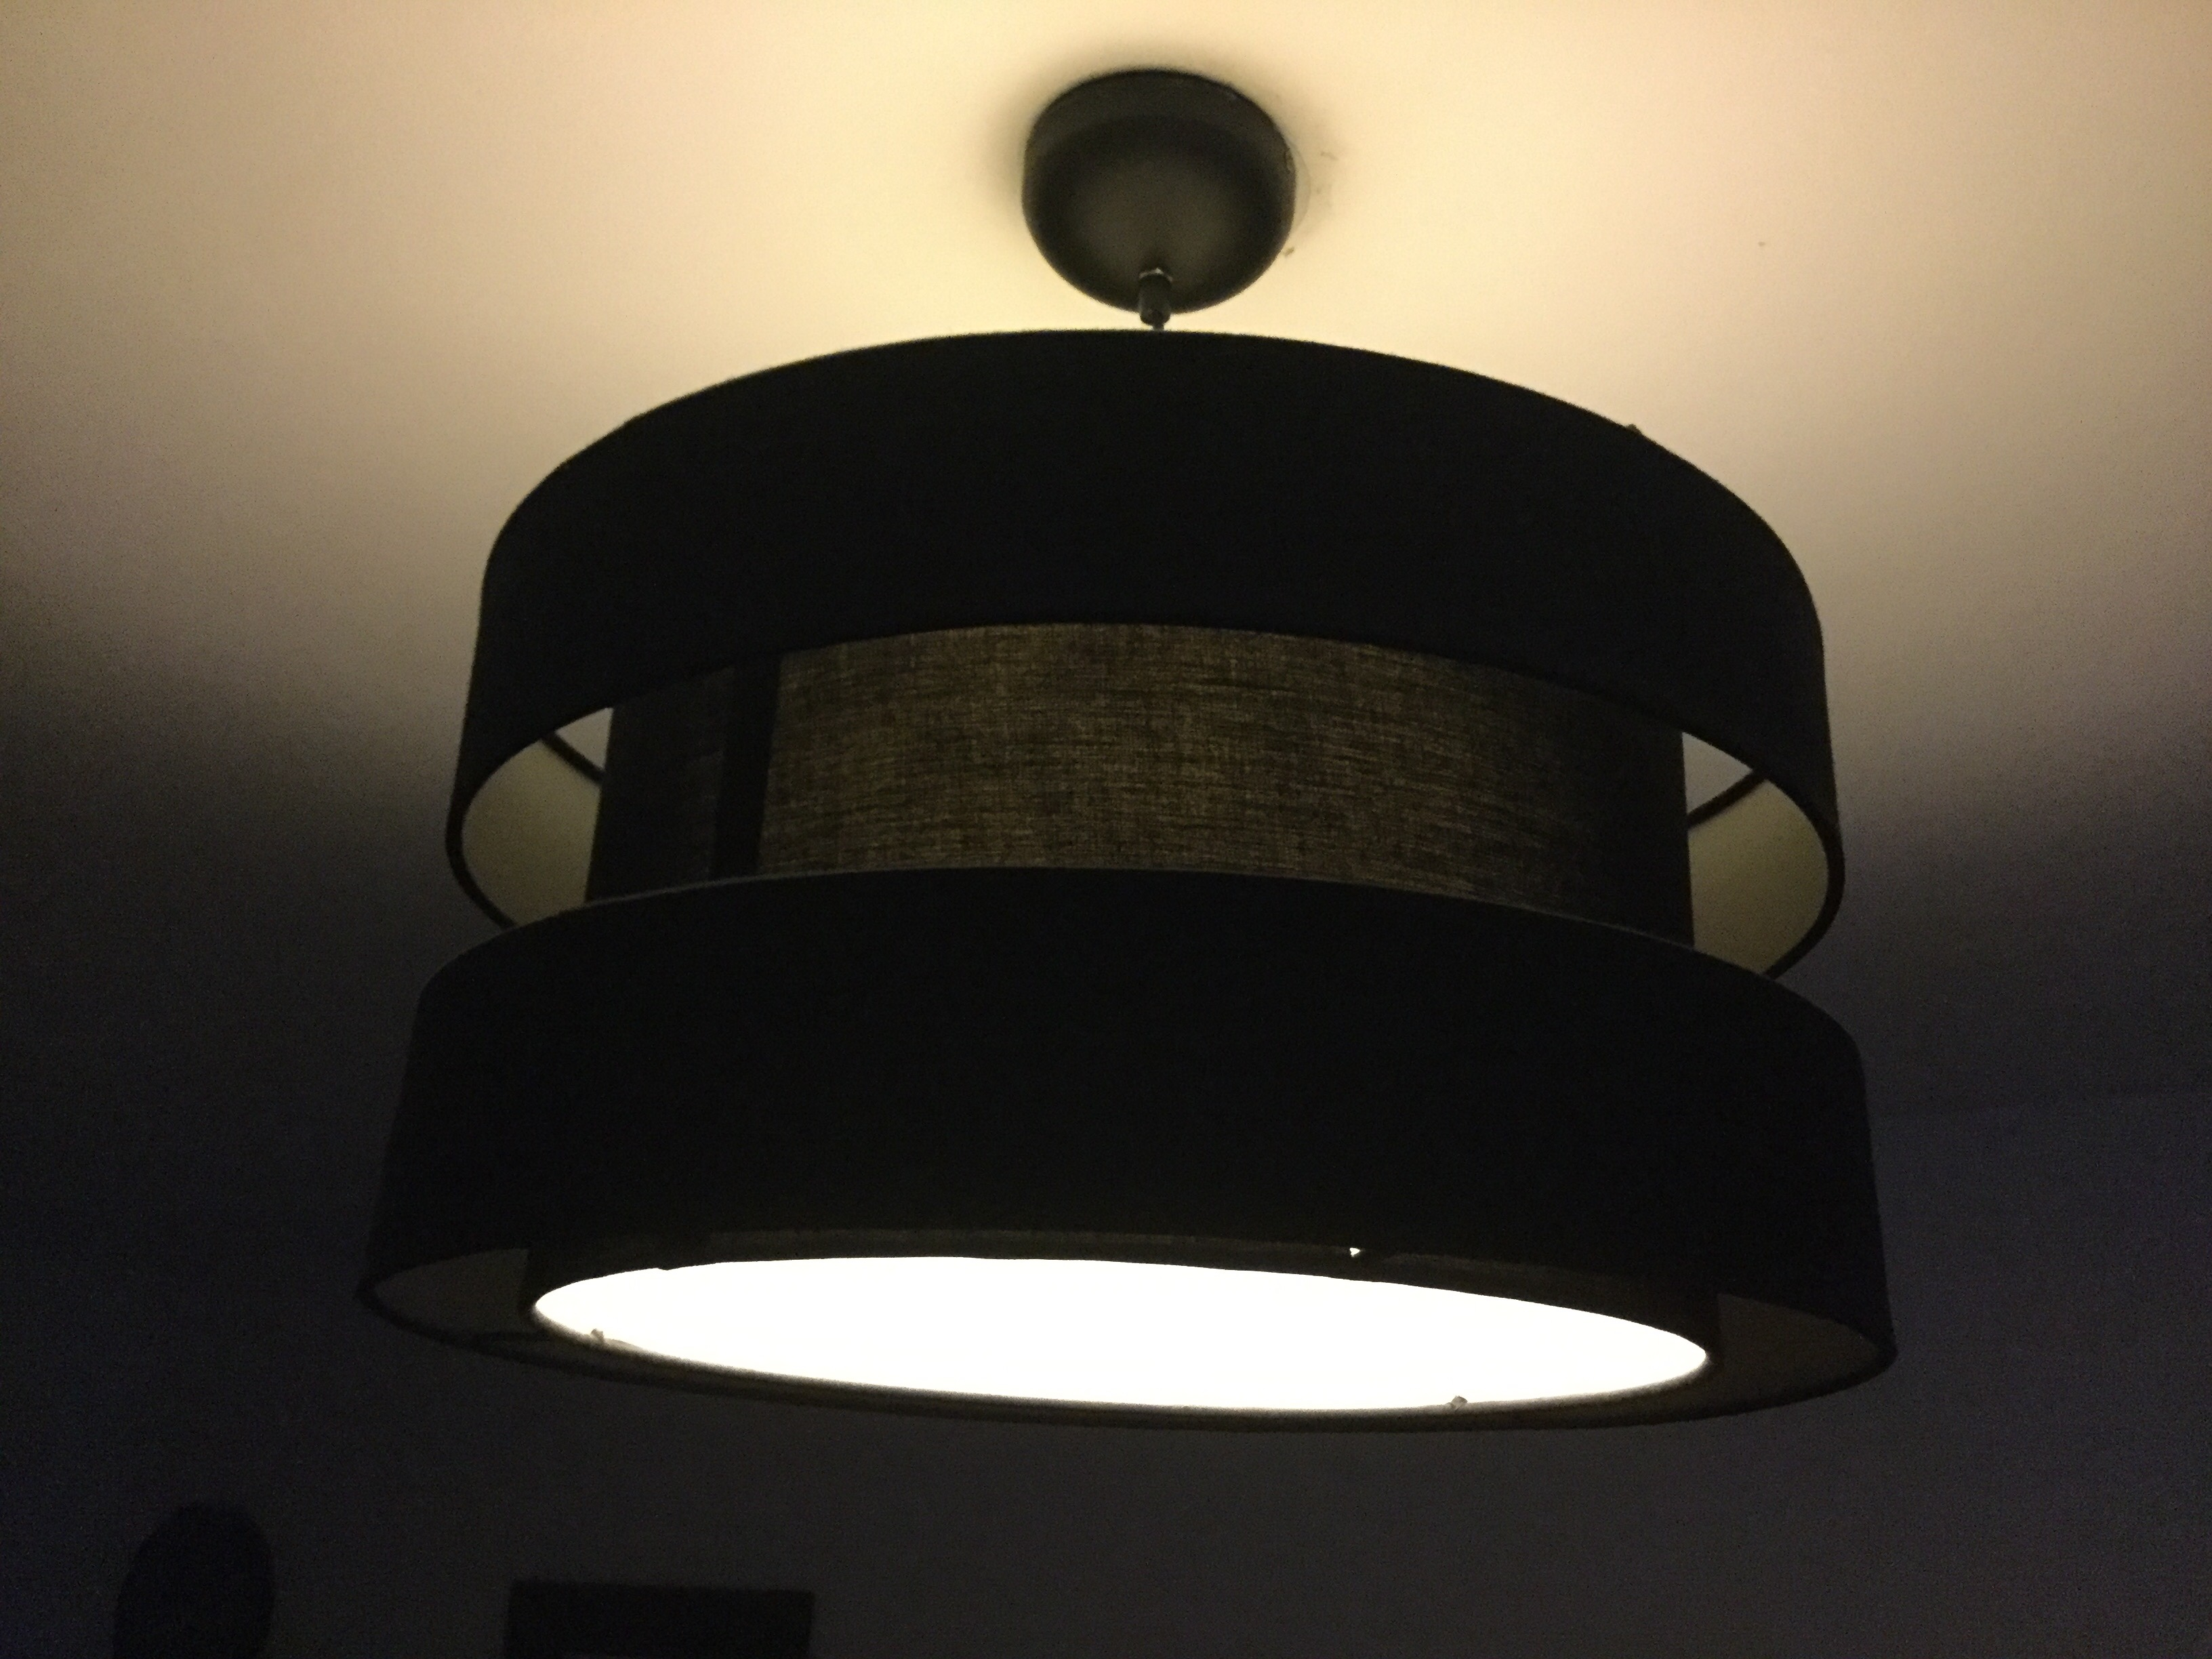 lustre castorama dcoration lustre pour salon saint denis tete photo lustre design leroy merlin. Black Bedroom Furniture Sets. Home Design Ideas